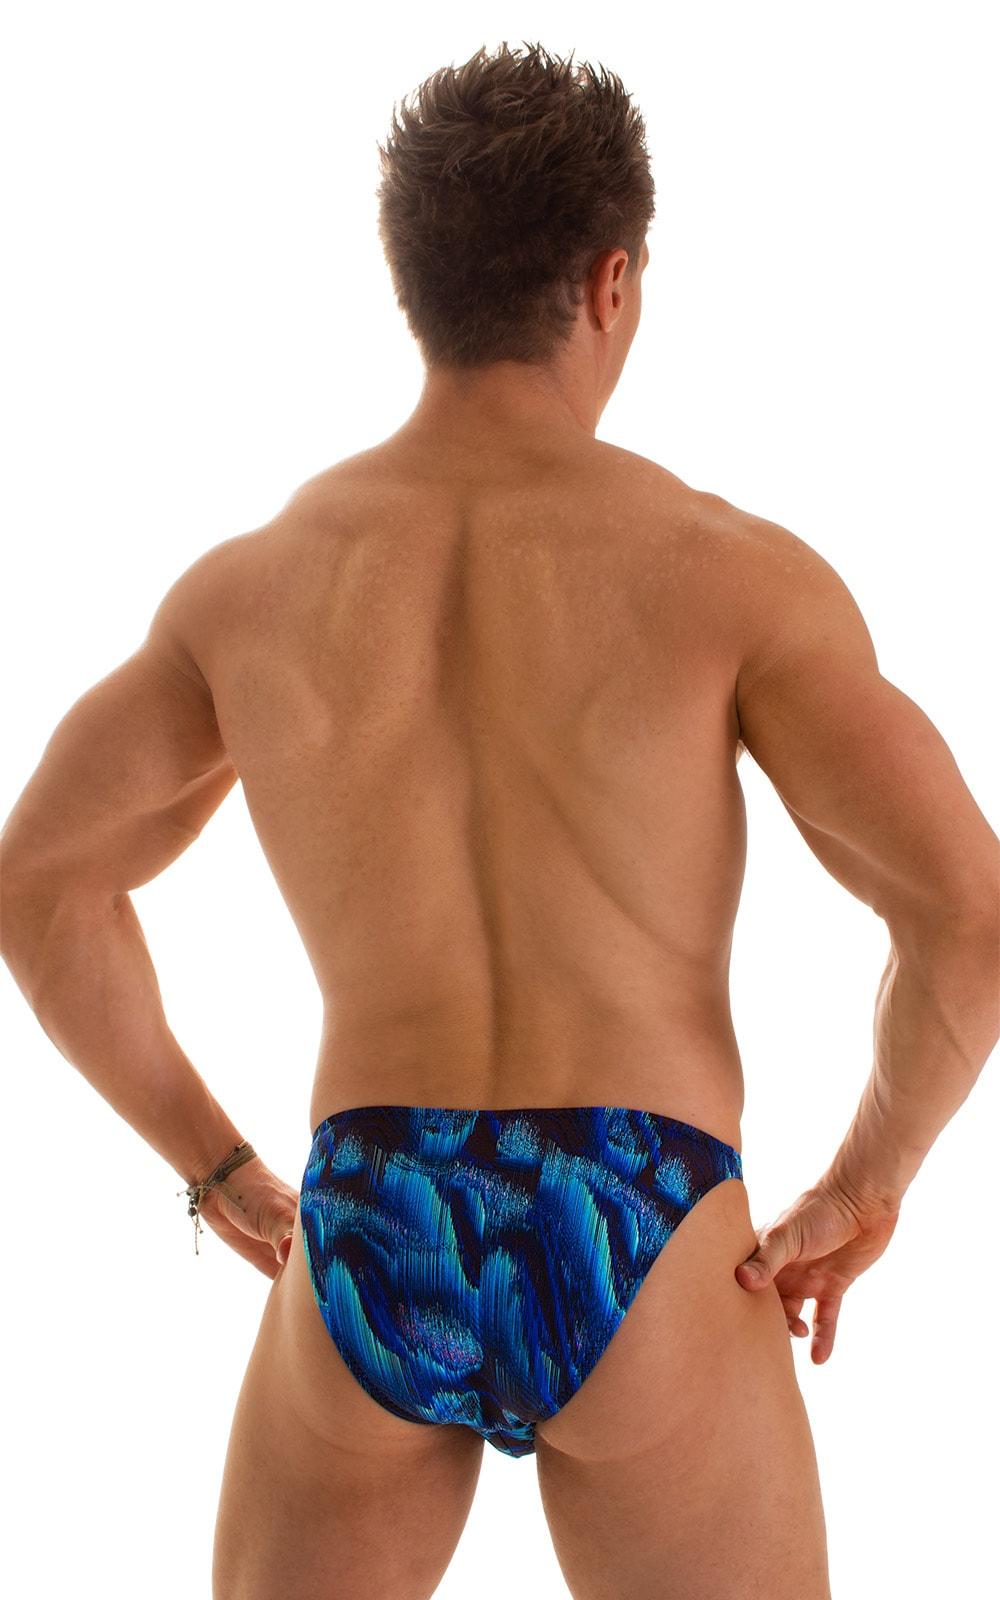 Fitted Bikini Bathing Suit in Digital Rush Blue 2